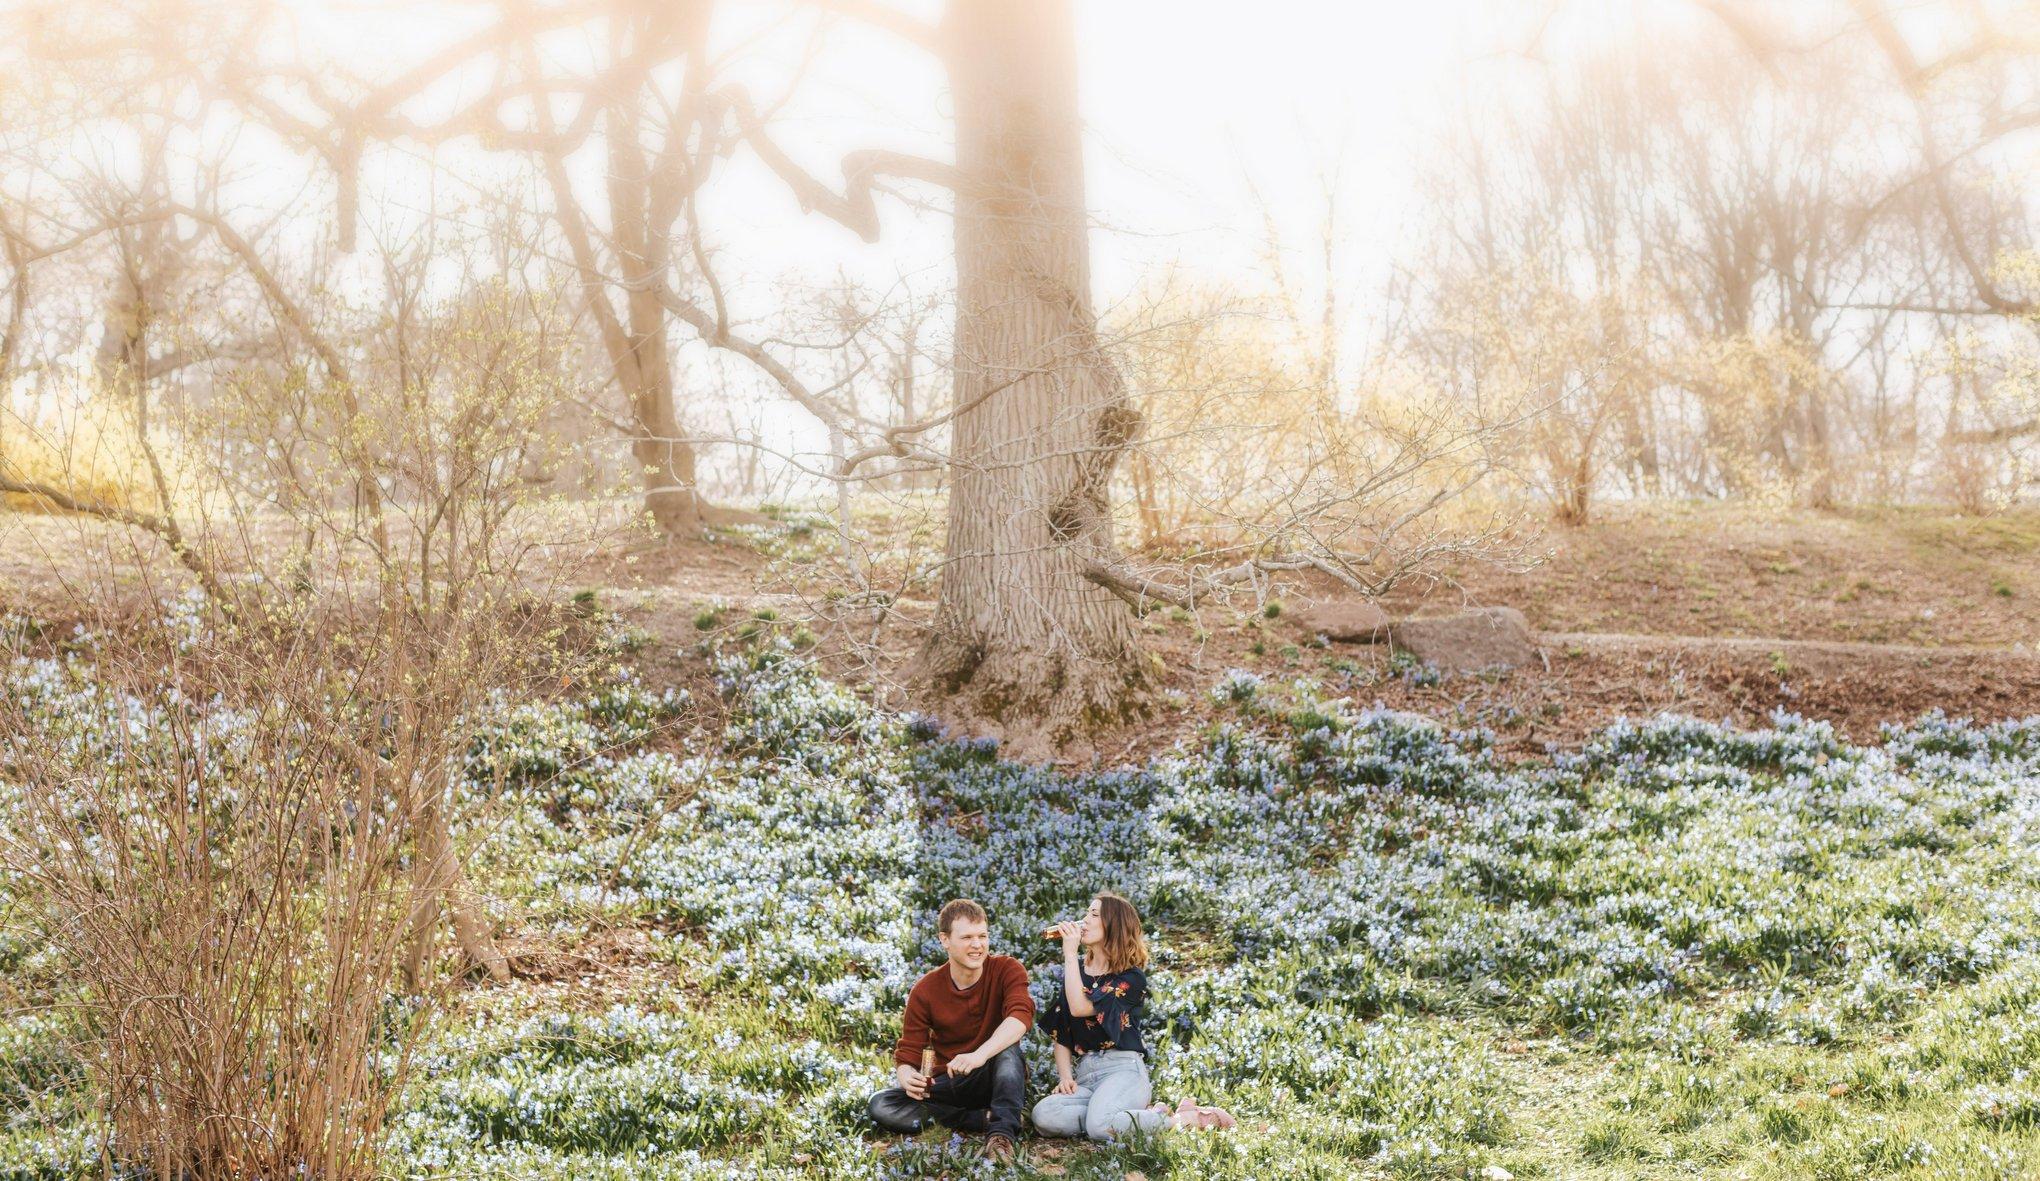 Arnold-Arboretum-Boston-Engagement-Lena-Mirisola-12.jpg